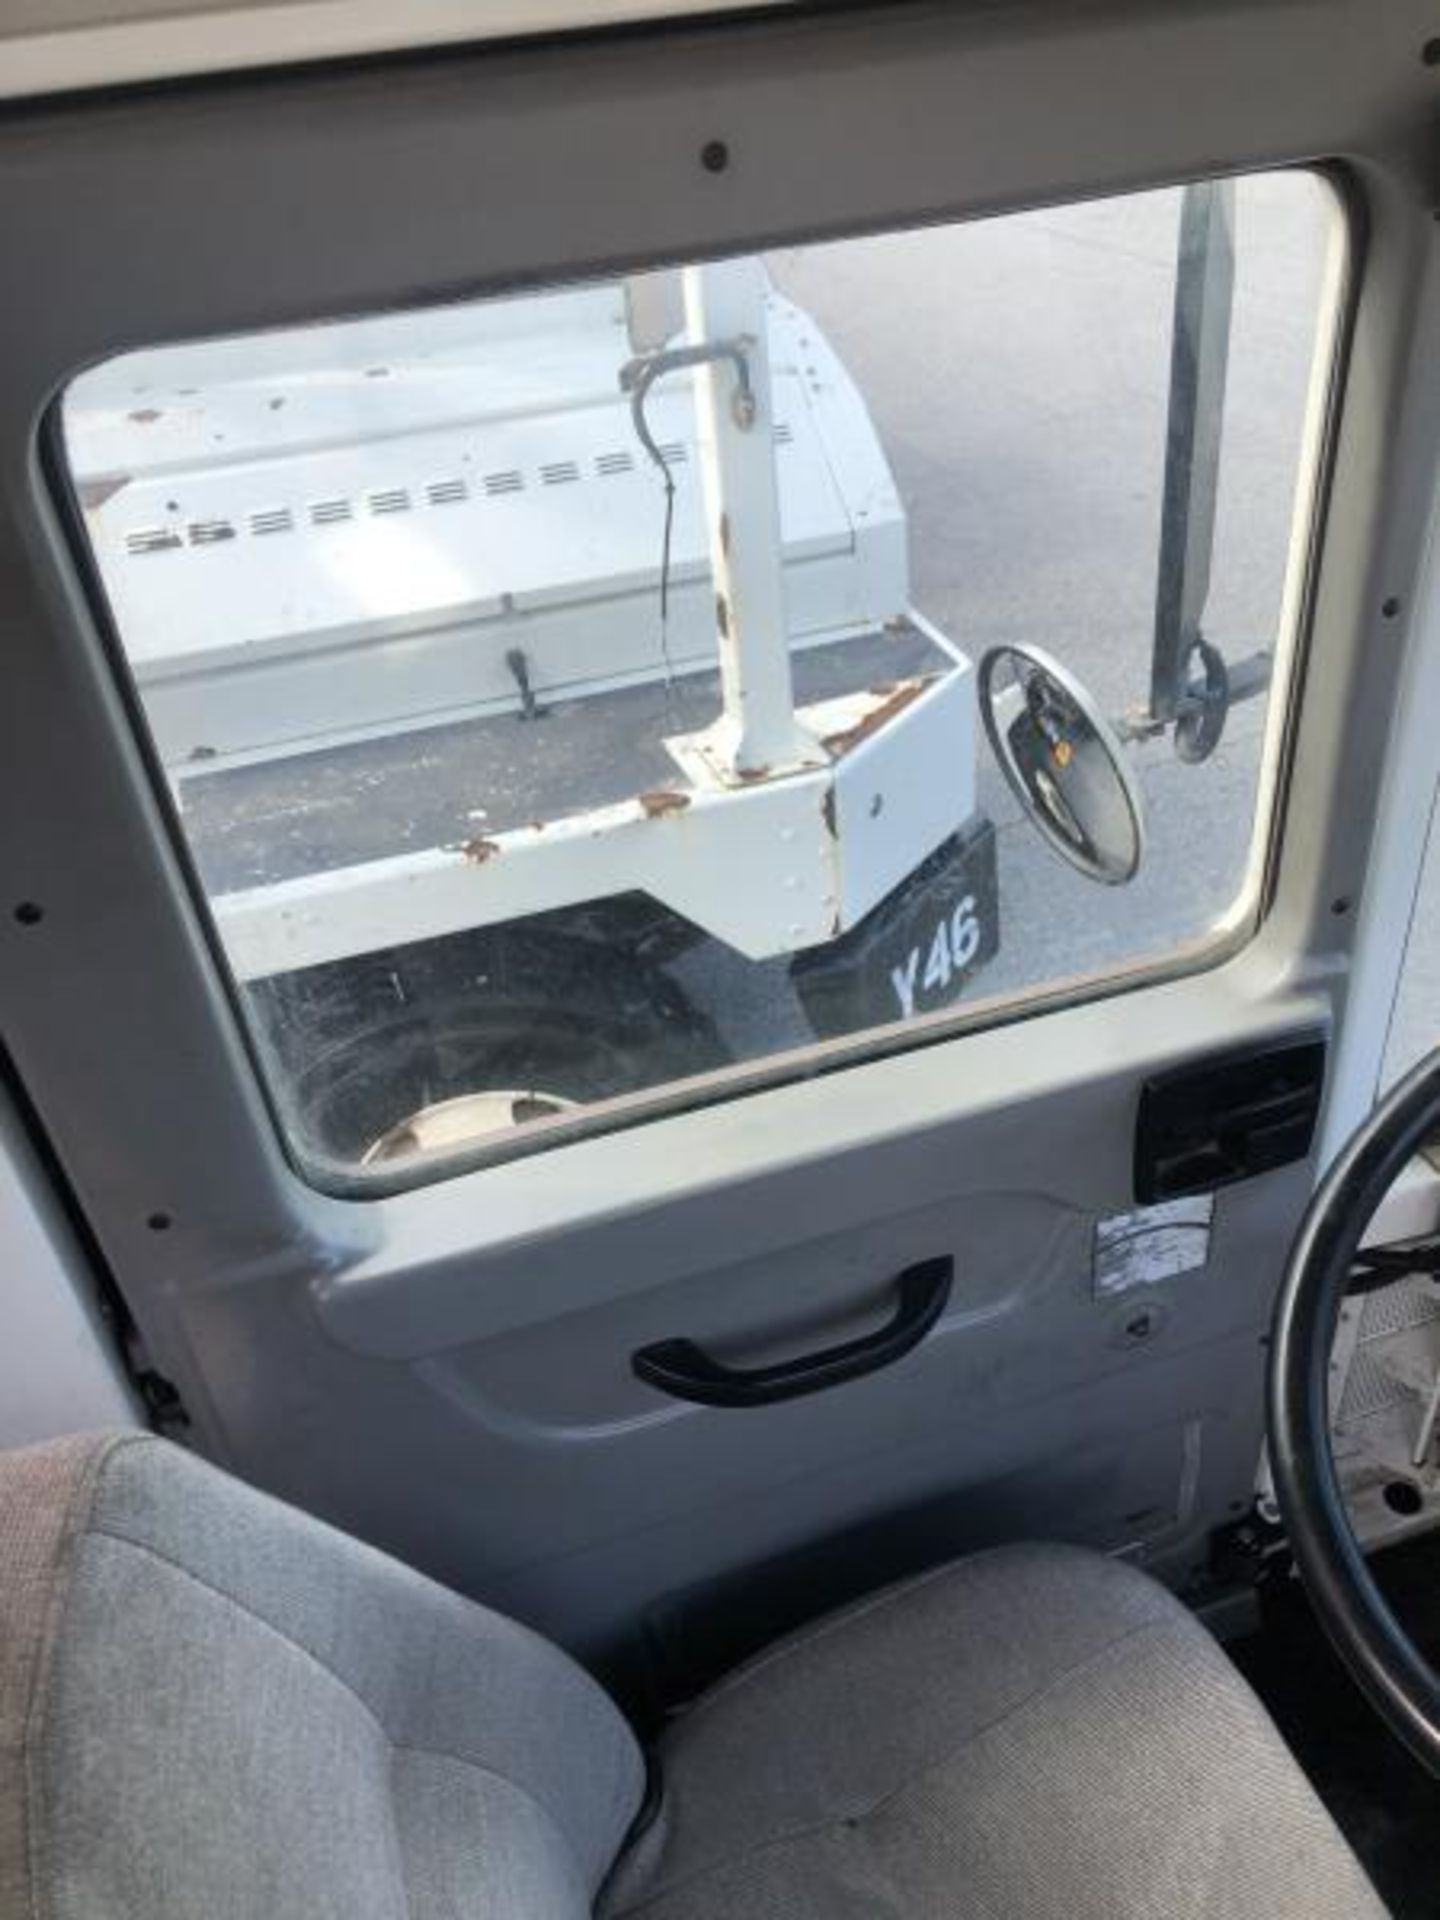 2015 Kalmar Ottawa 4x2 Yard Truck , SN: 338837 3,239.3 Hours, 3,125 Miles - Image 24 of 32